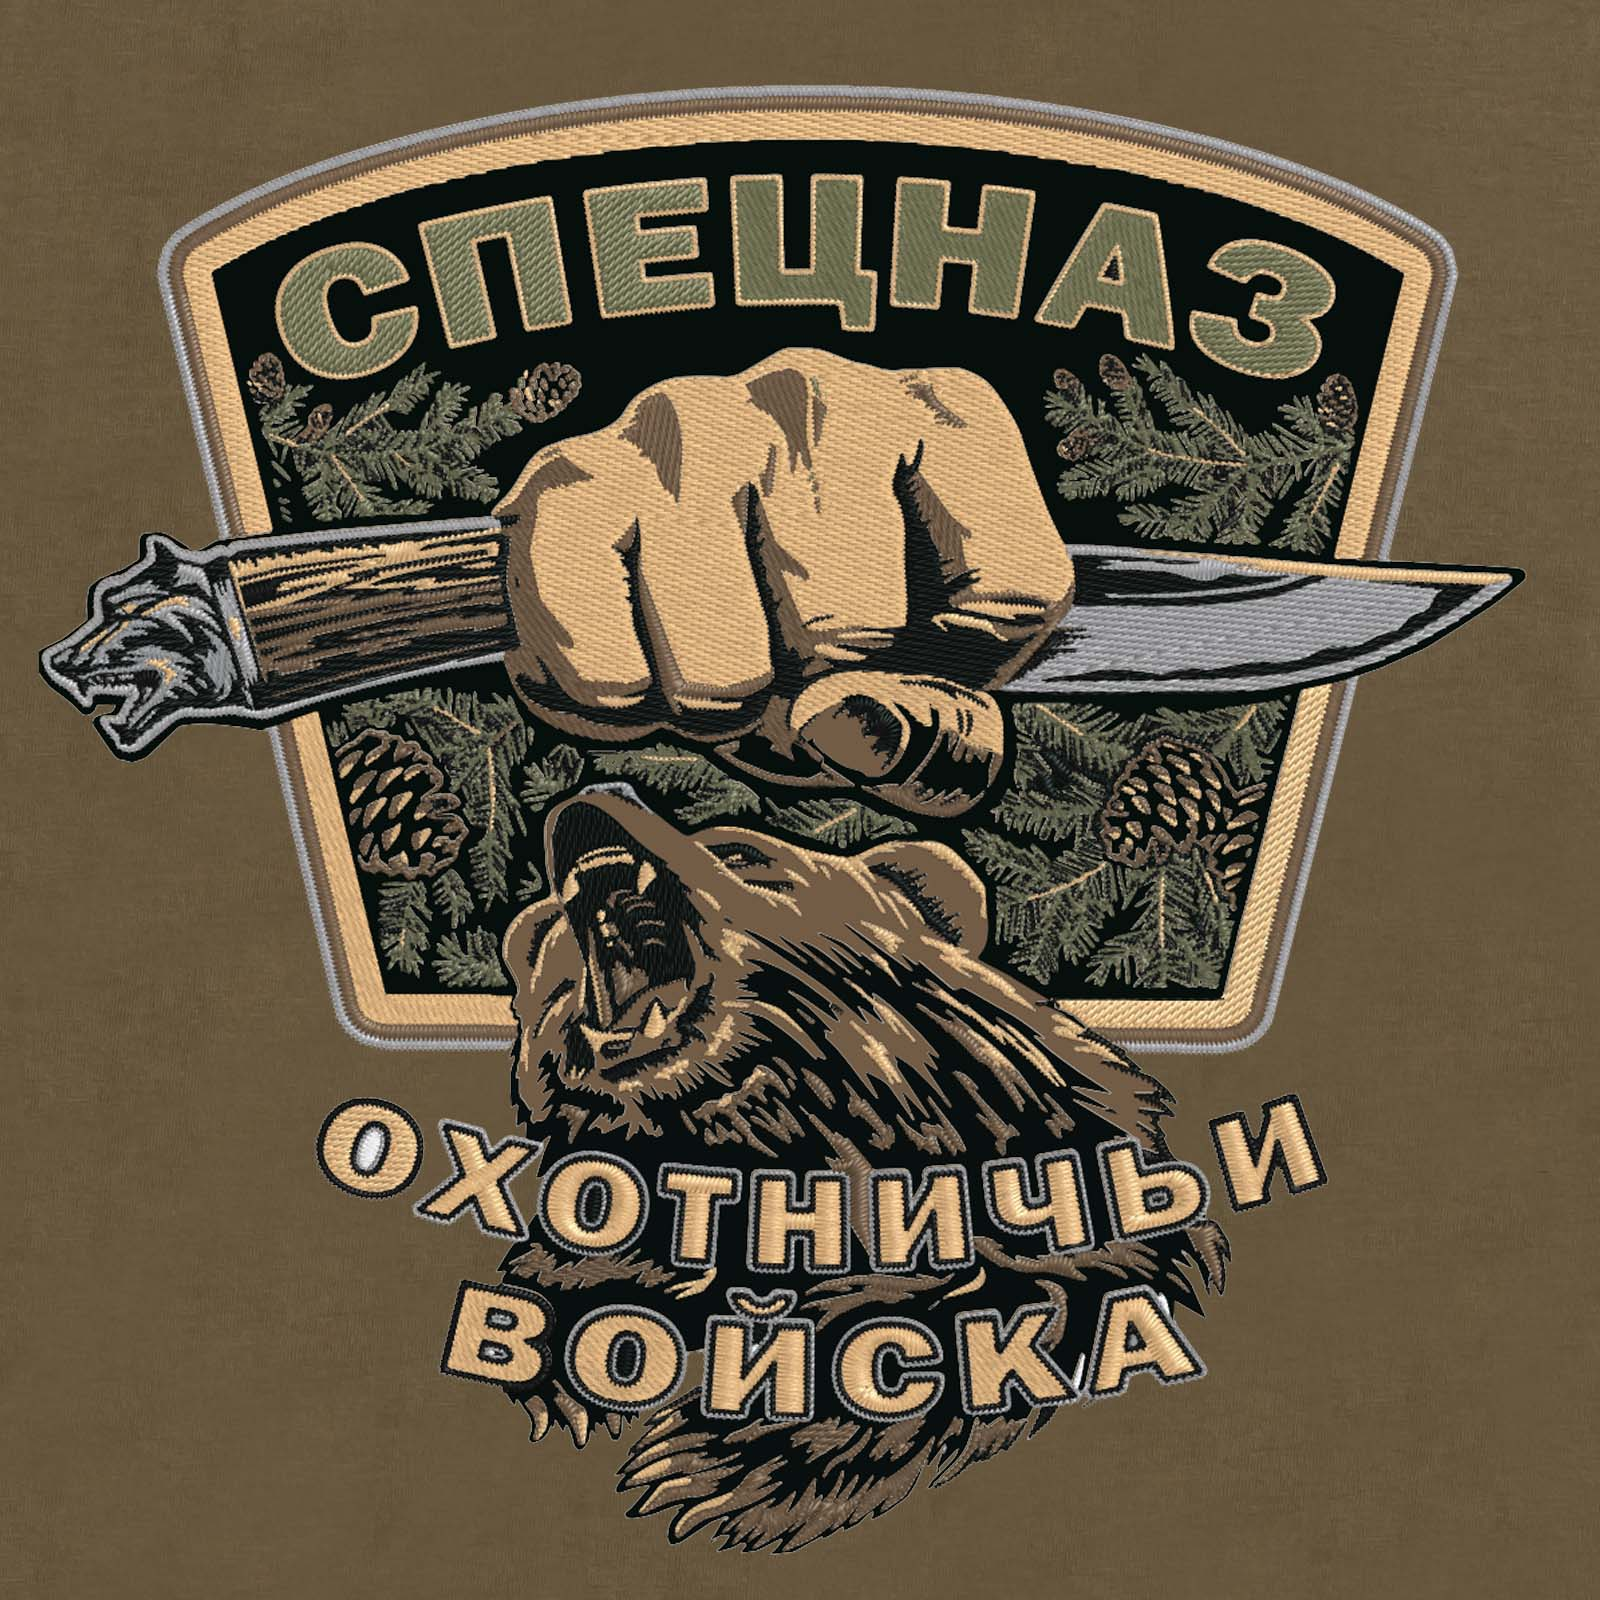 "Футболка хаки с вышивкой ""Охотничий спецназ"" от Военпро"